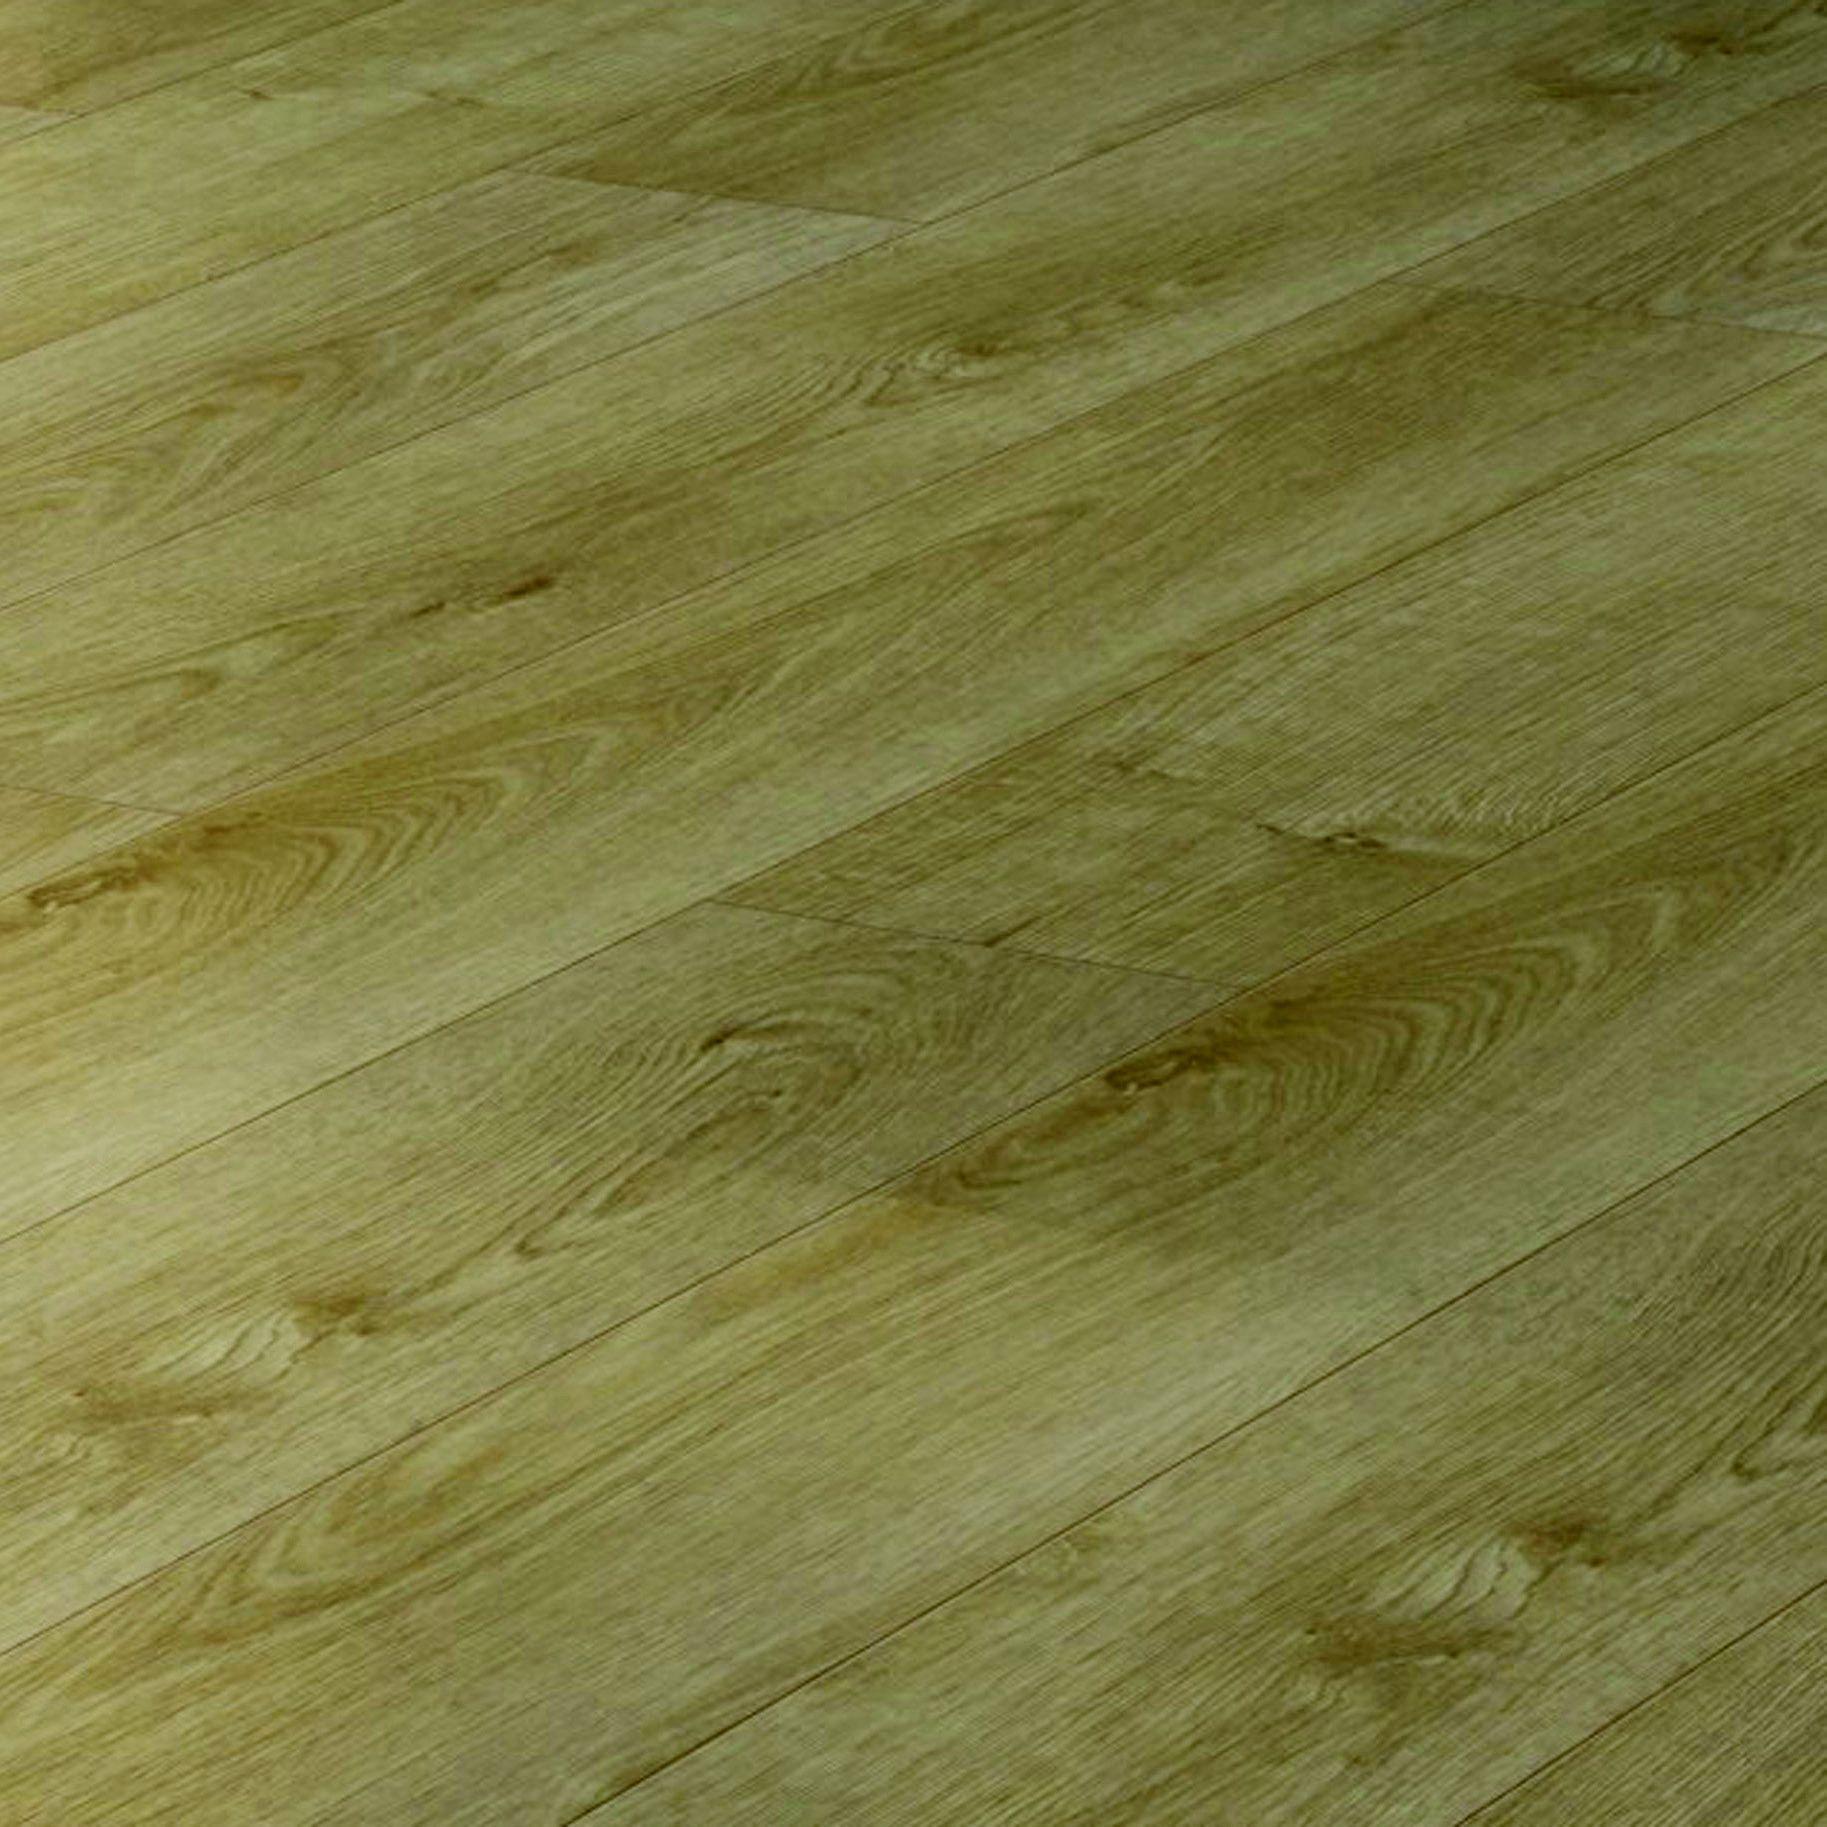 Tileloc milano oak effect laminate flooring 125 m pack tileloc milano oak effect laminate flooring 125 m pack departments tradepoint doublecrazyfo Choice Image